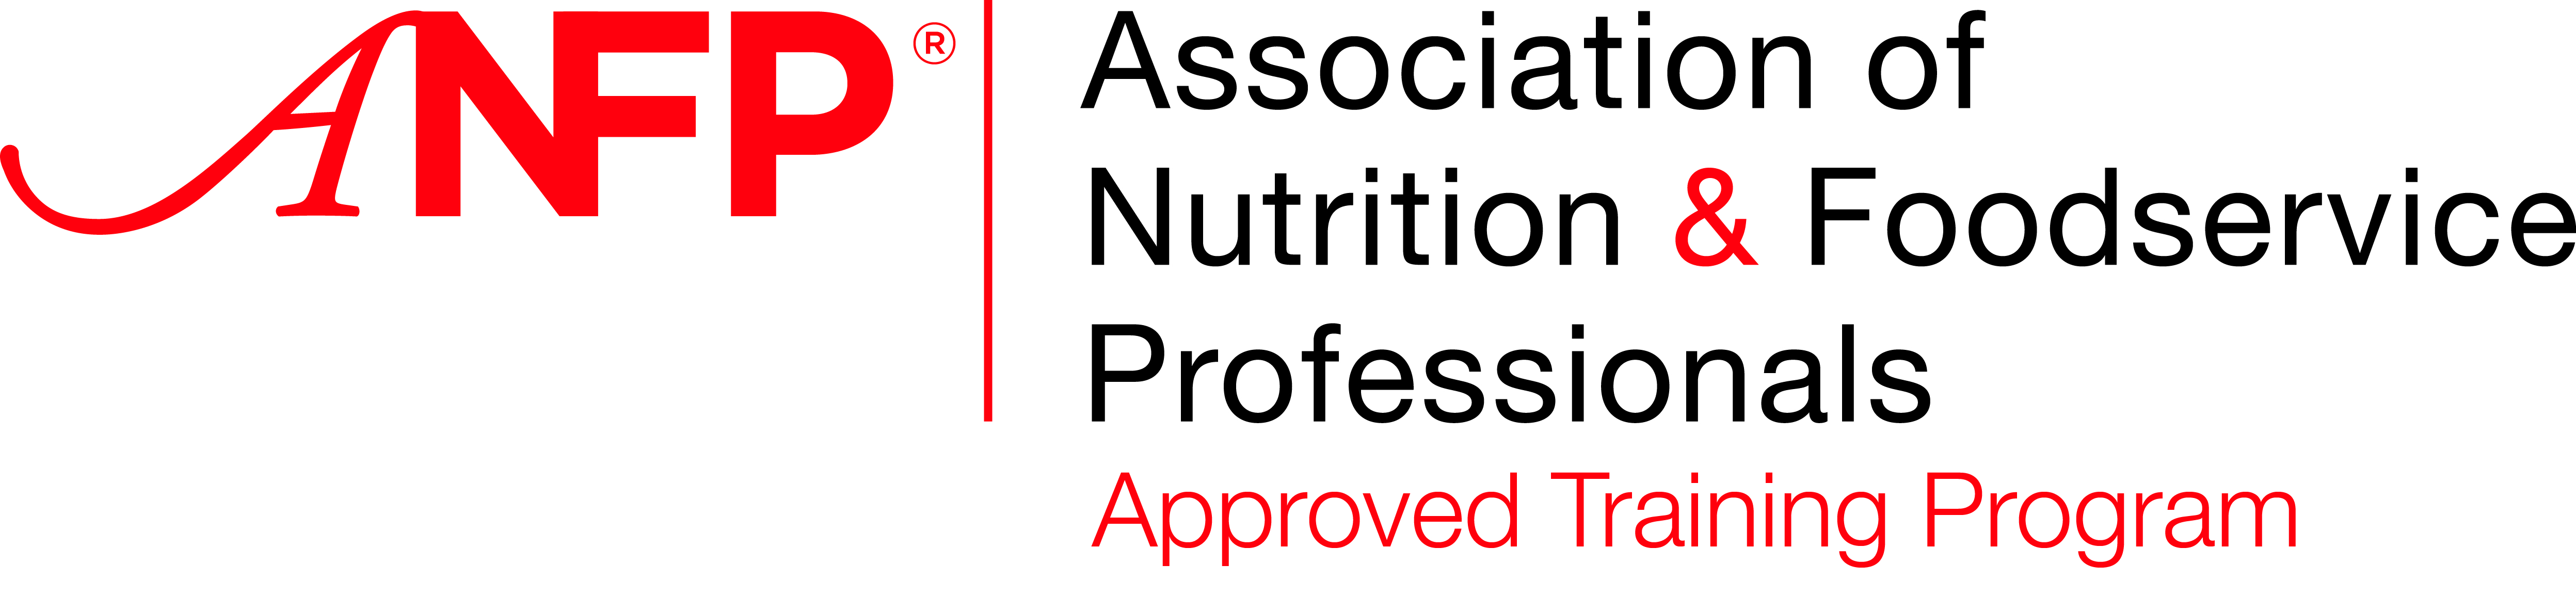 ANFP Logo_LG_cmyk_R_ApprovedP